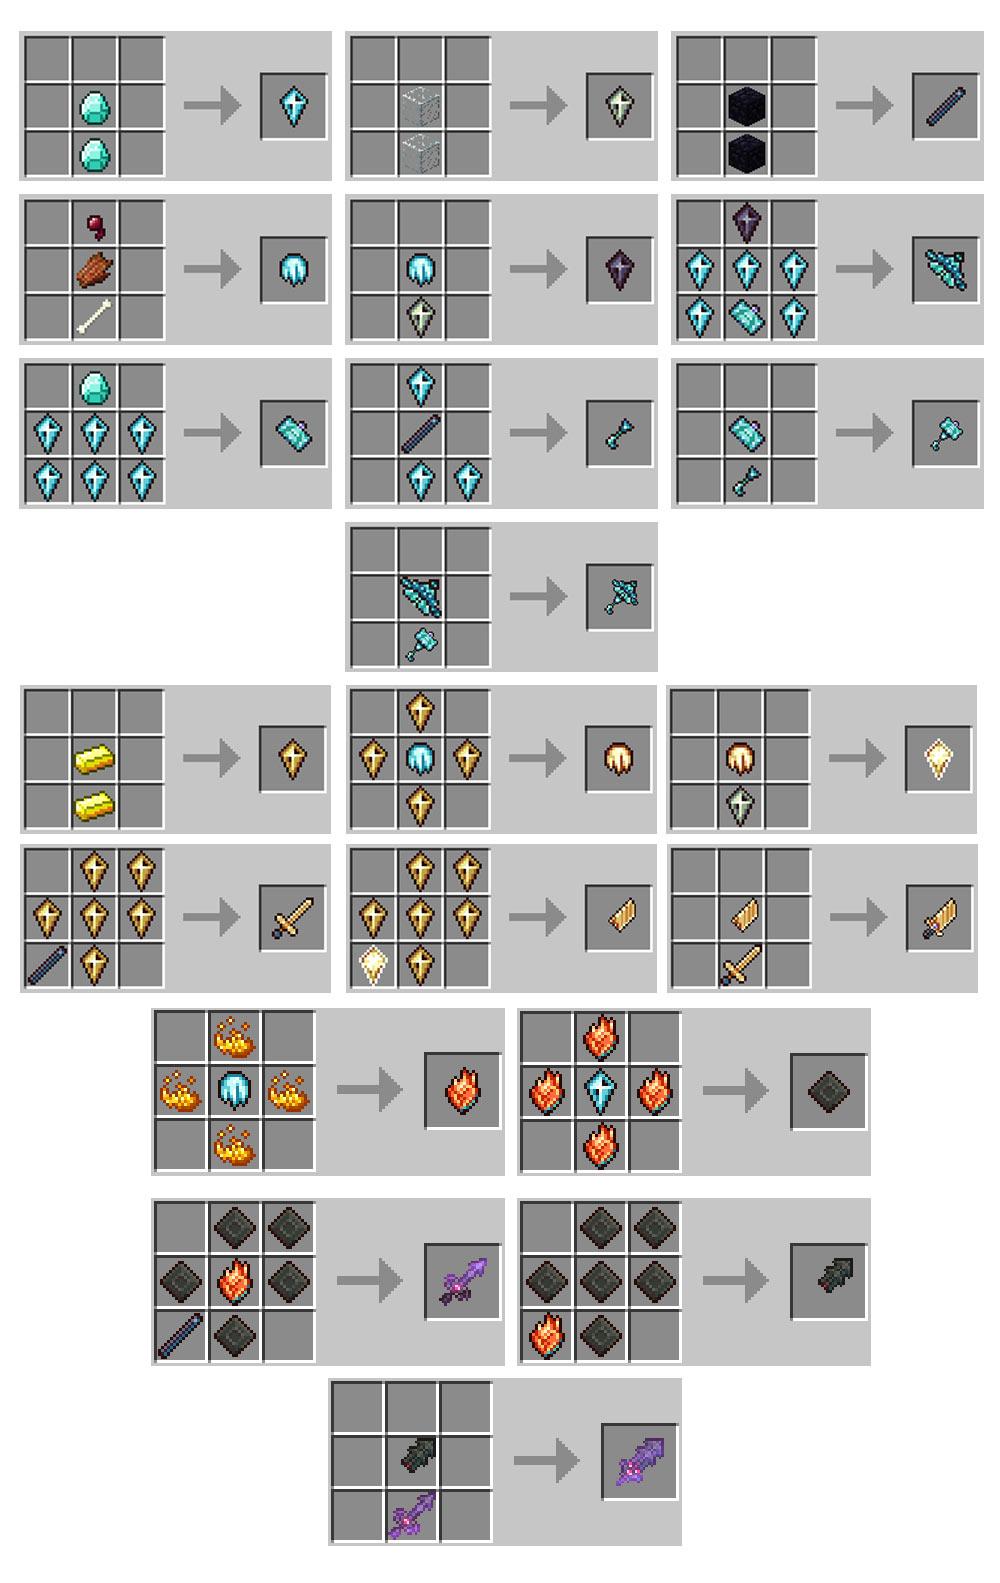 Custom Npcs Armor Crafting Recipes | Treeofflife org